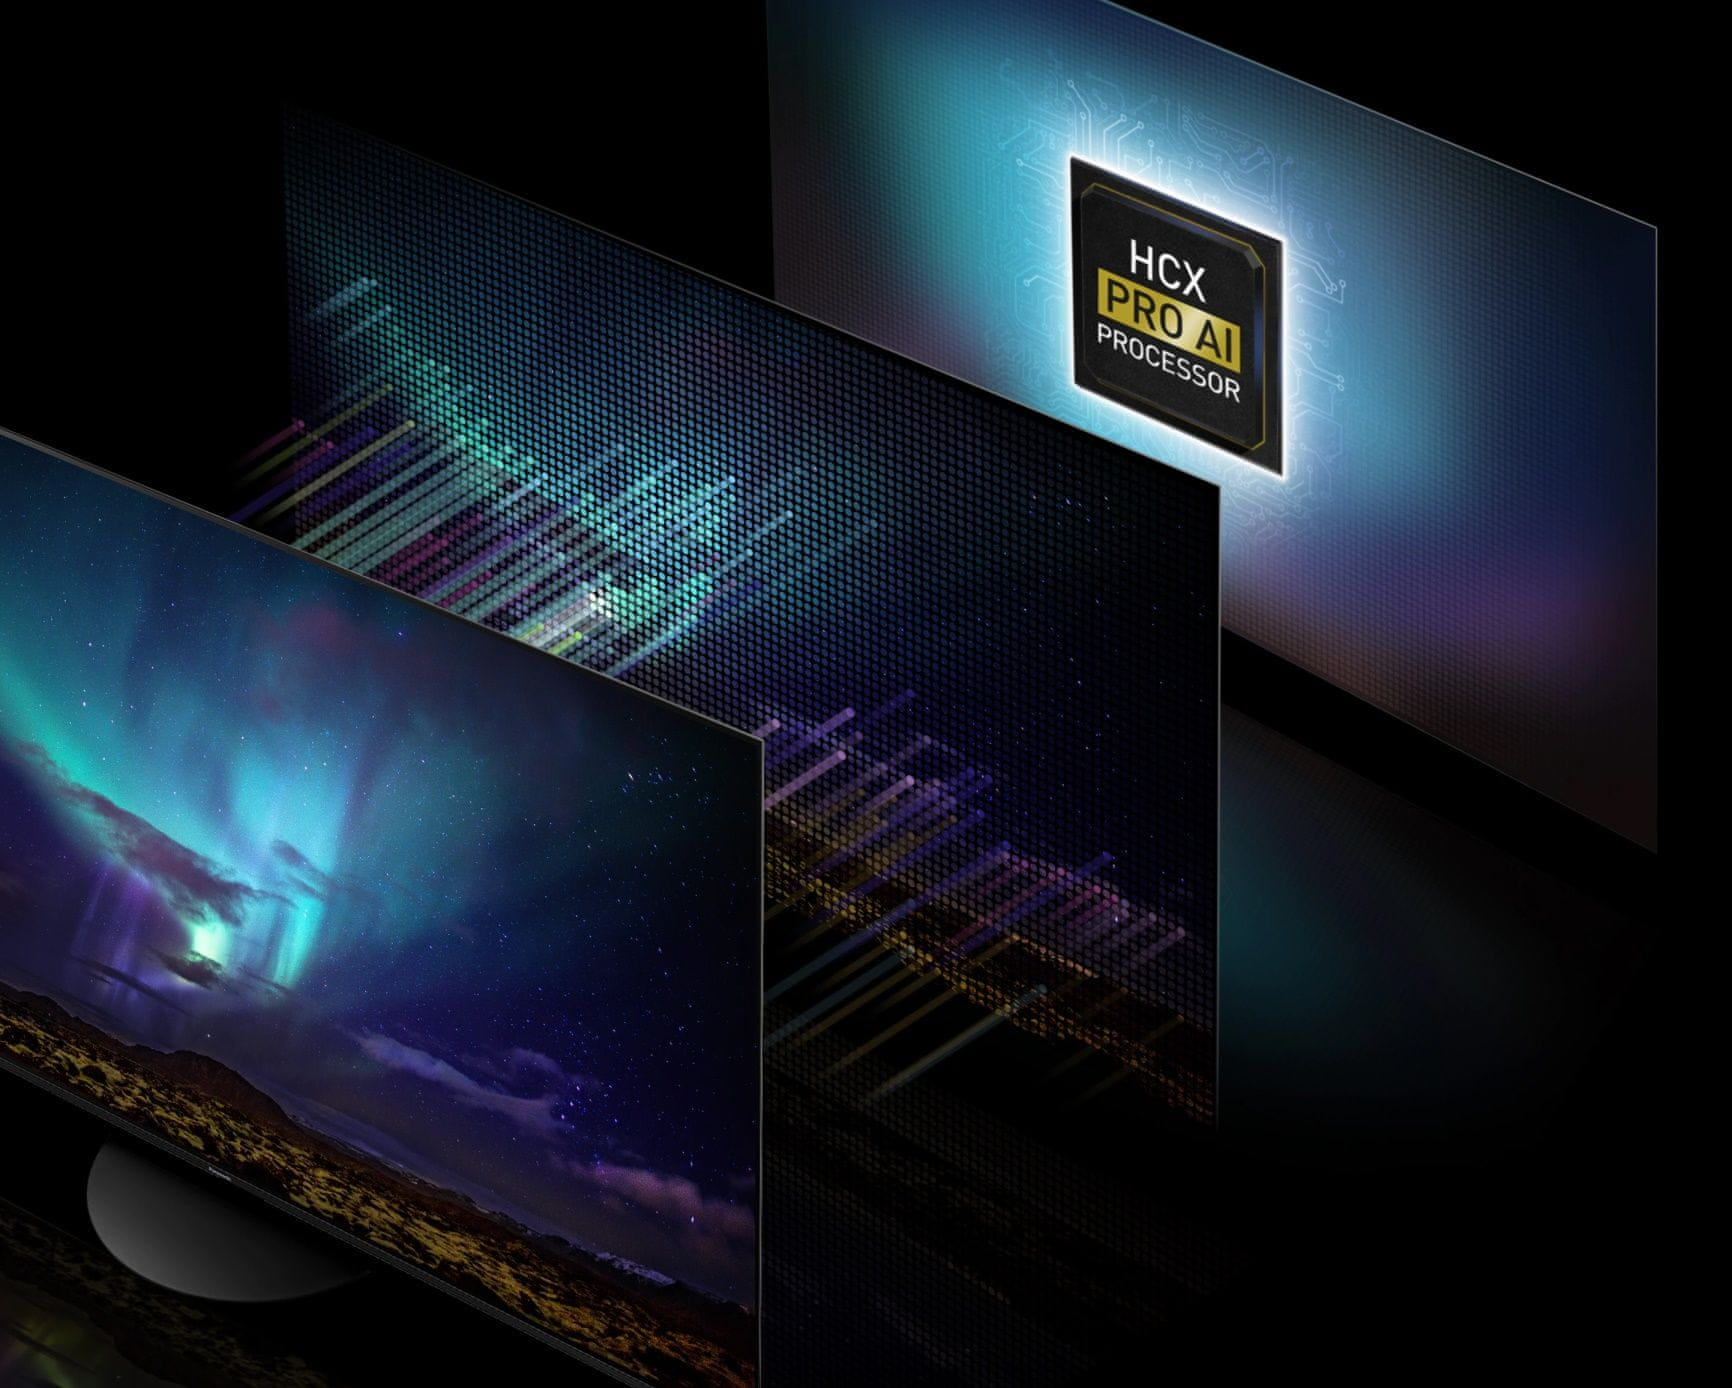 Panasonic TV televize OLED 4K 2021 okos processzor hcx pro ai